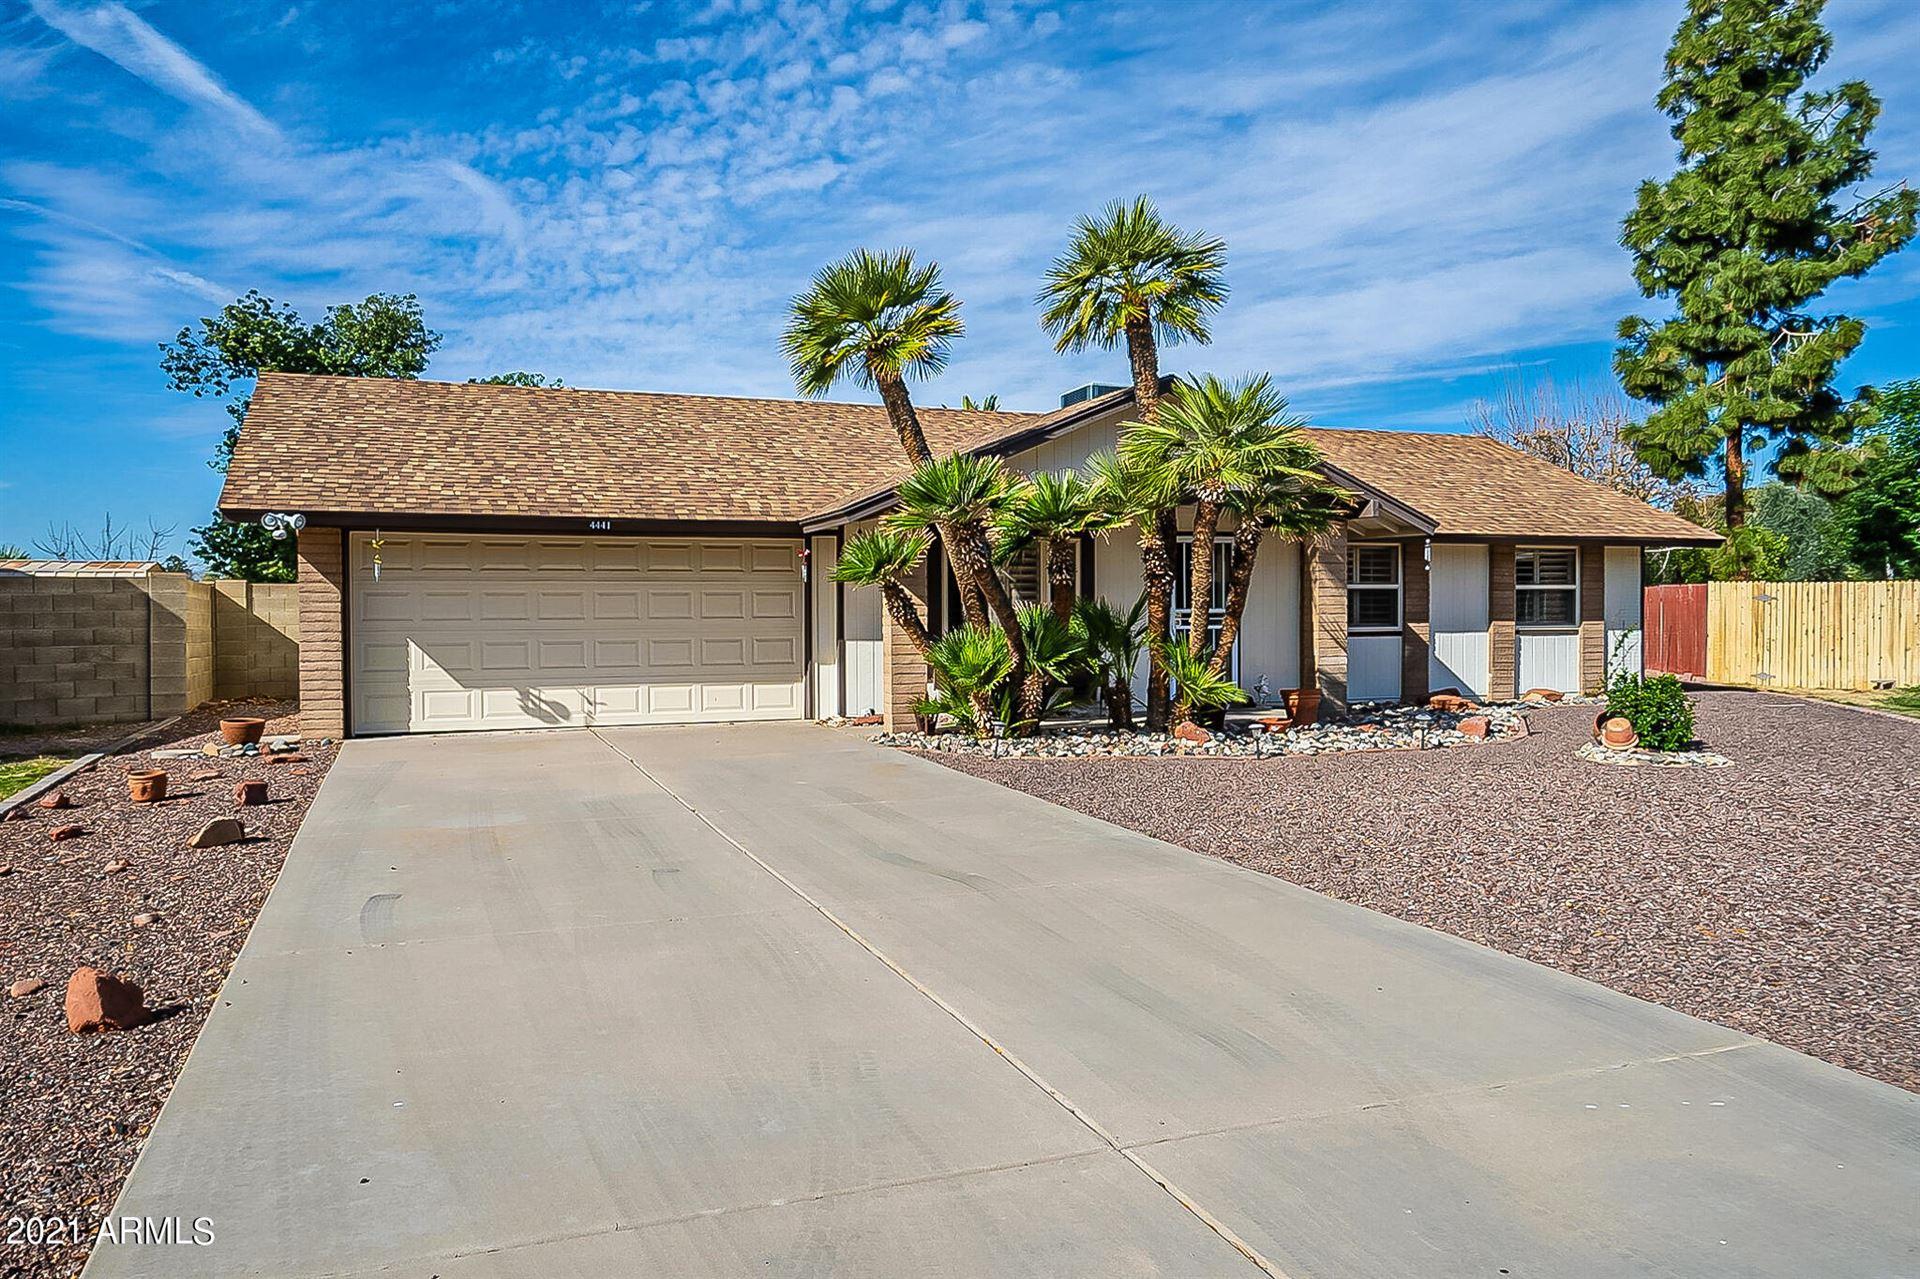 4441 W KEATING Circle, Glendale, AZ 85308 - MLS#: 6201871